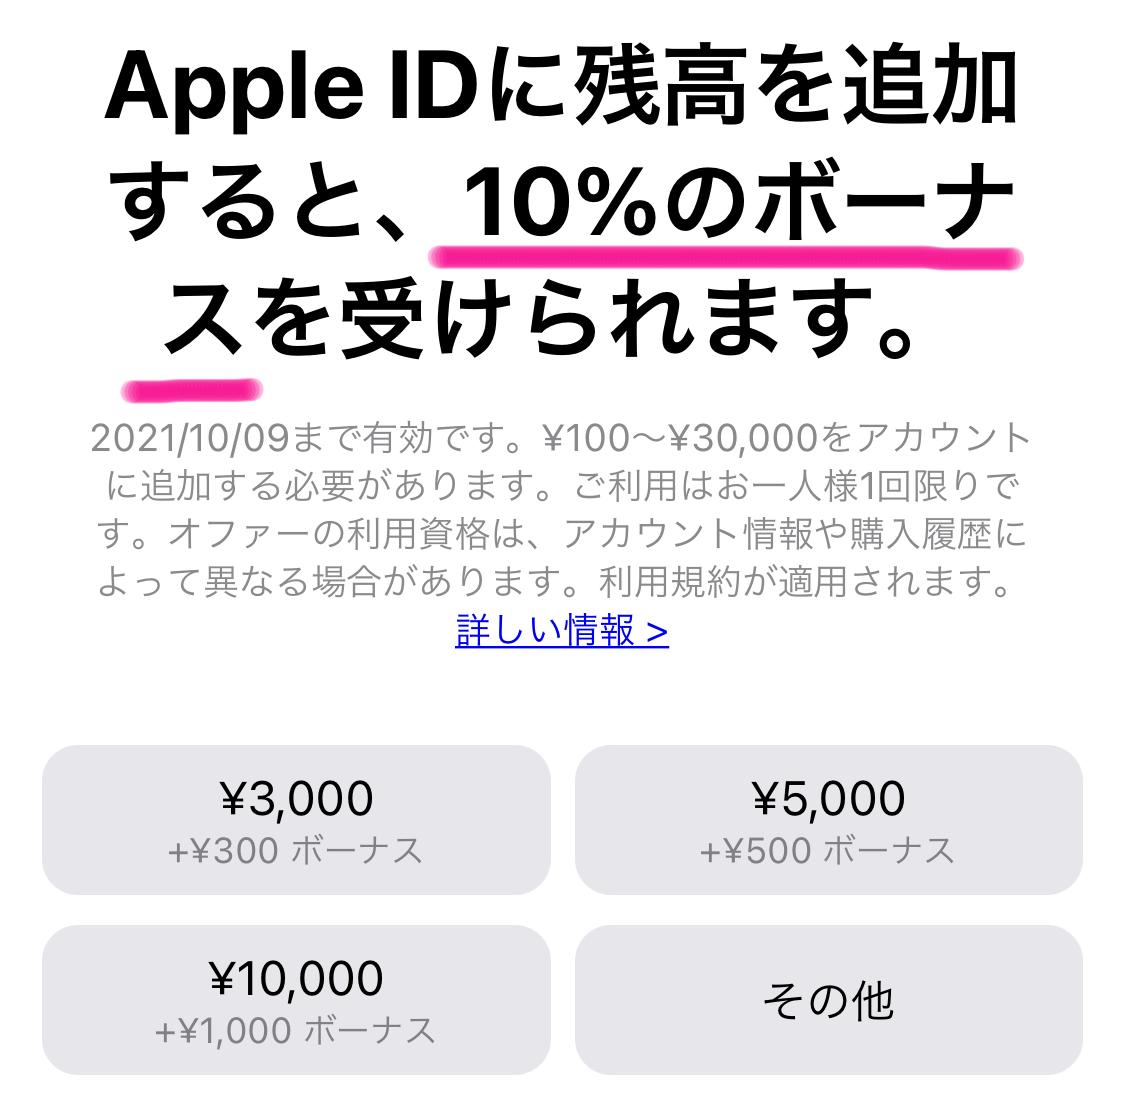 Appleid 10perpoint 02